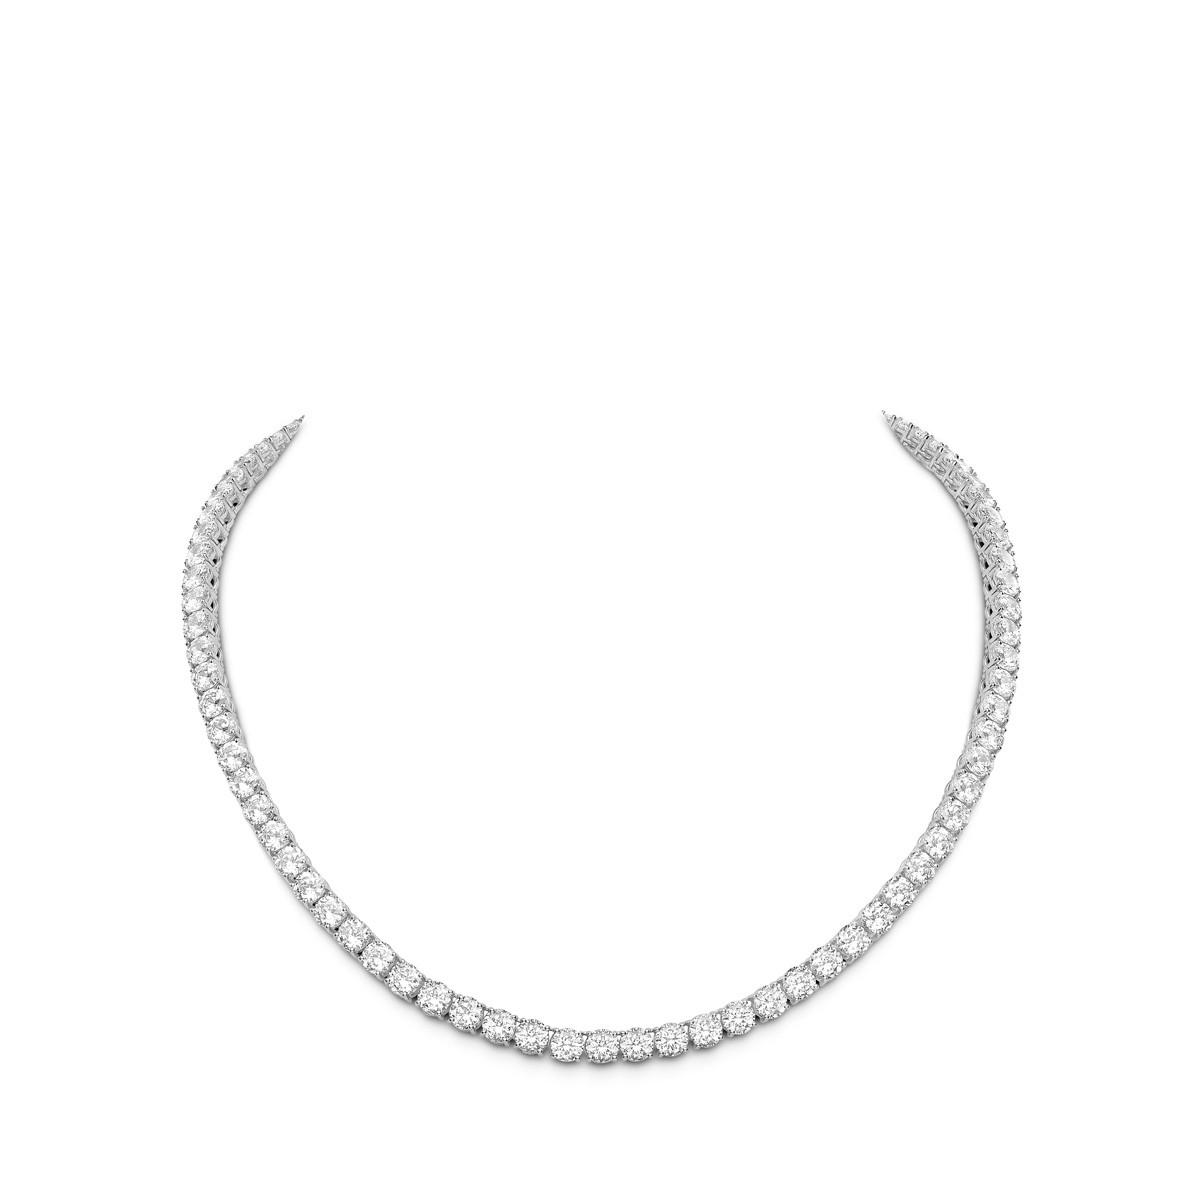 Line Necklace - Isomorphic Diamonds in White Gold